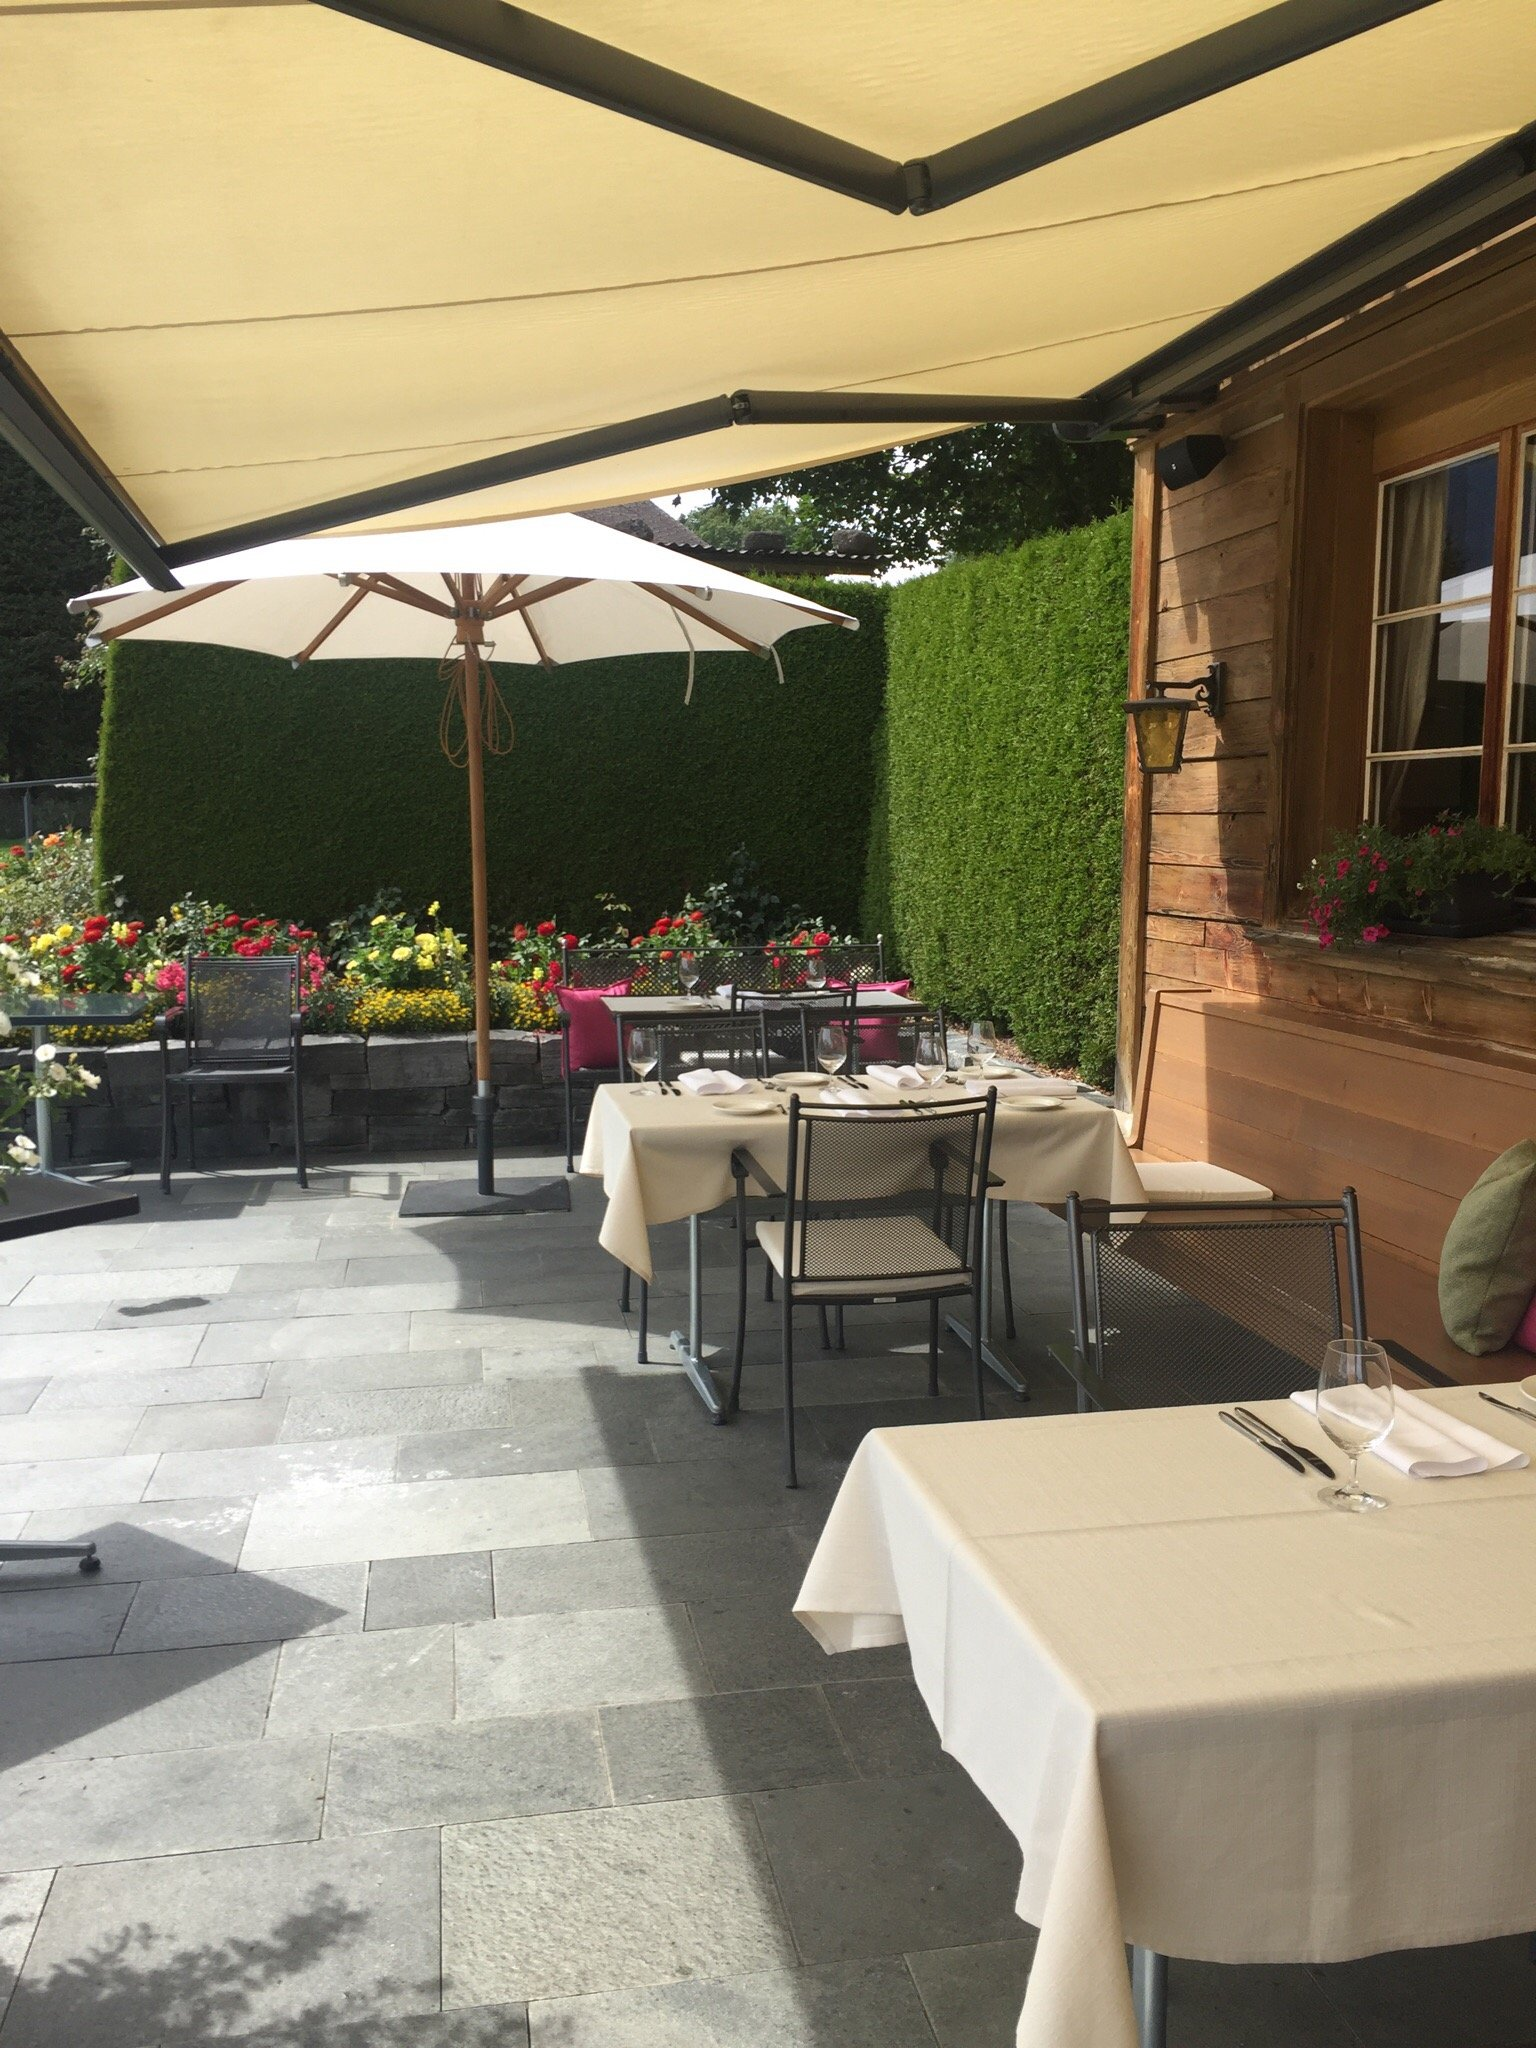 Sonnenhof Gstaad Restaurant Reviews Phone Number & s